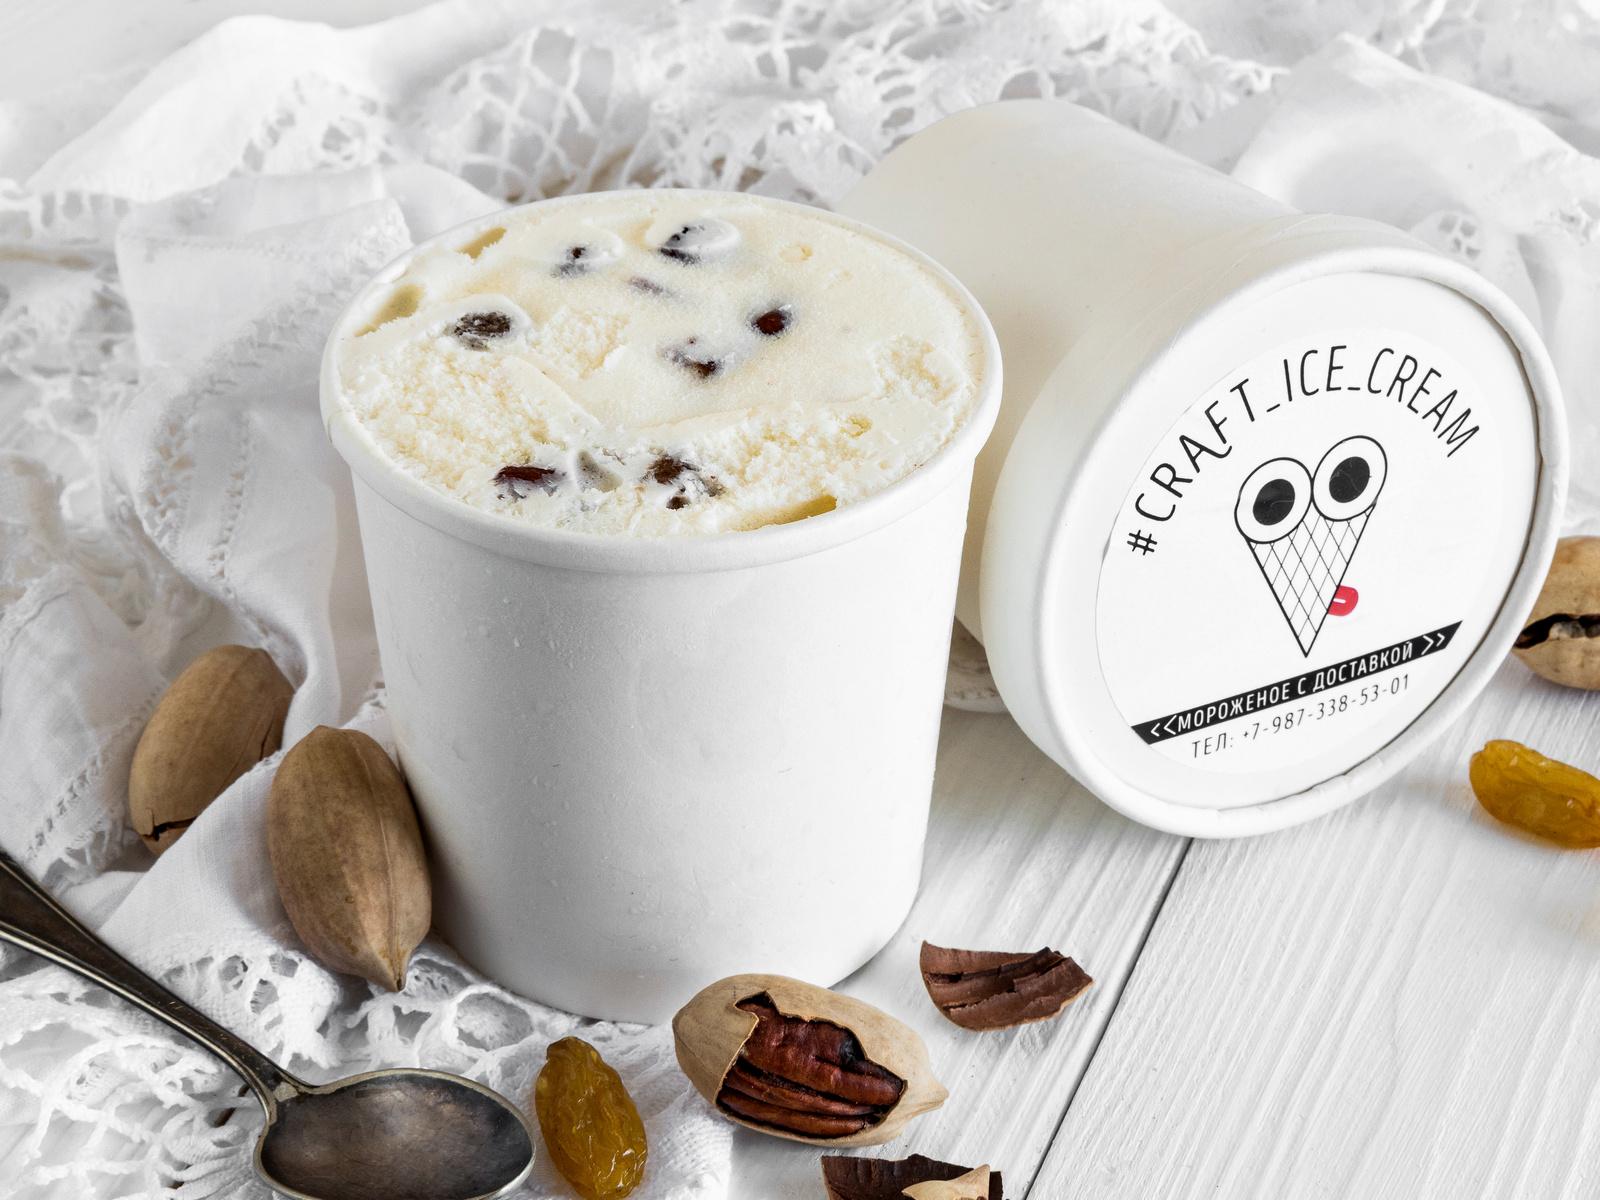 Мороженое Изюм и орех пекан